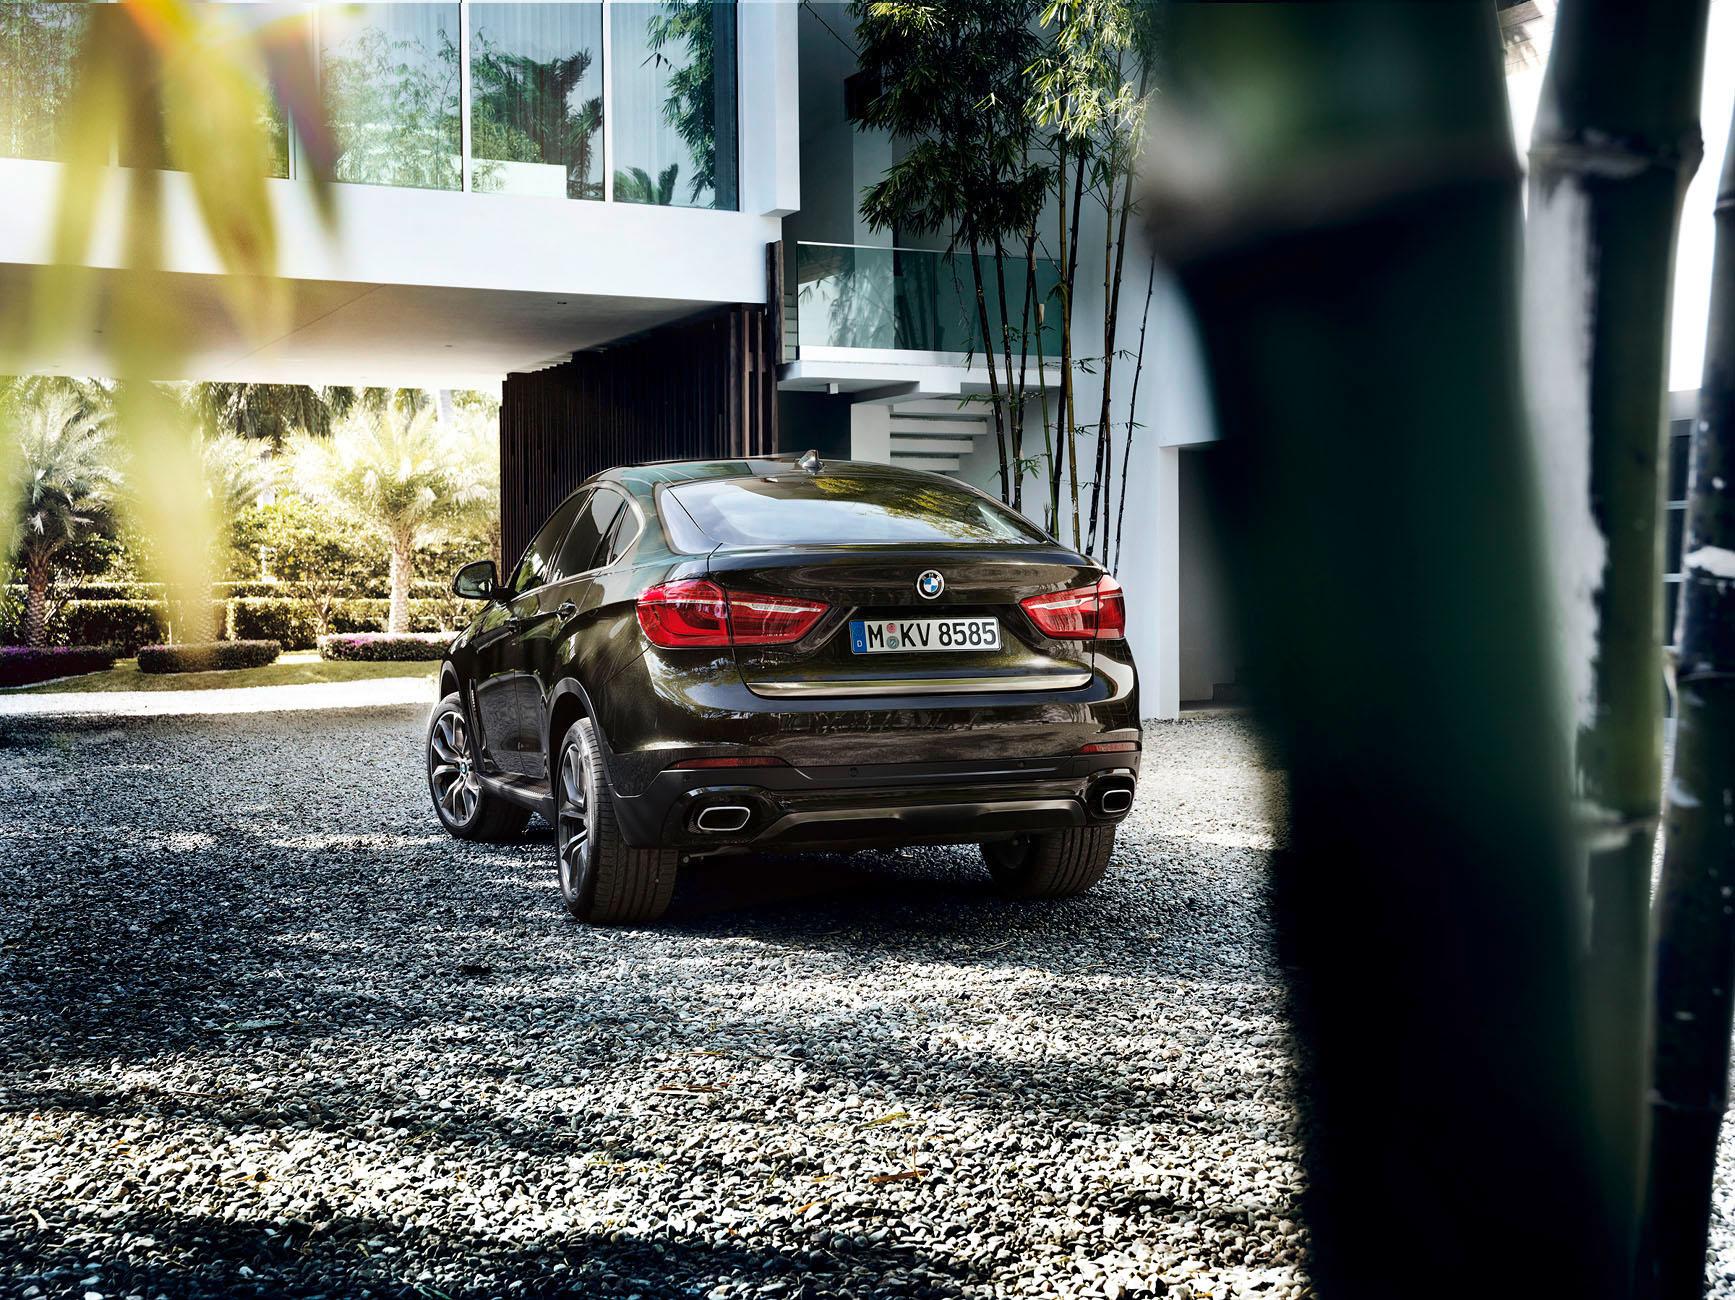 BMW X6 - Miami 02 | Mietstudio München, Showroom, Postproduktion